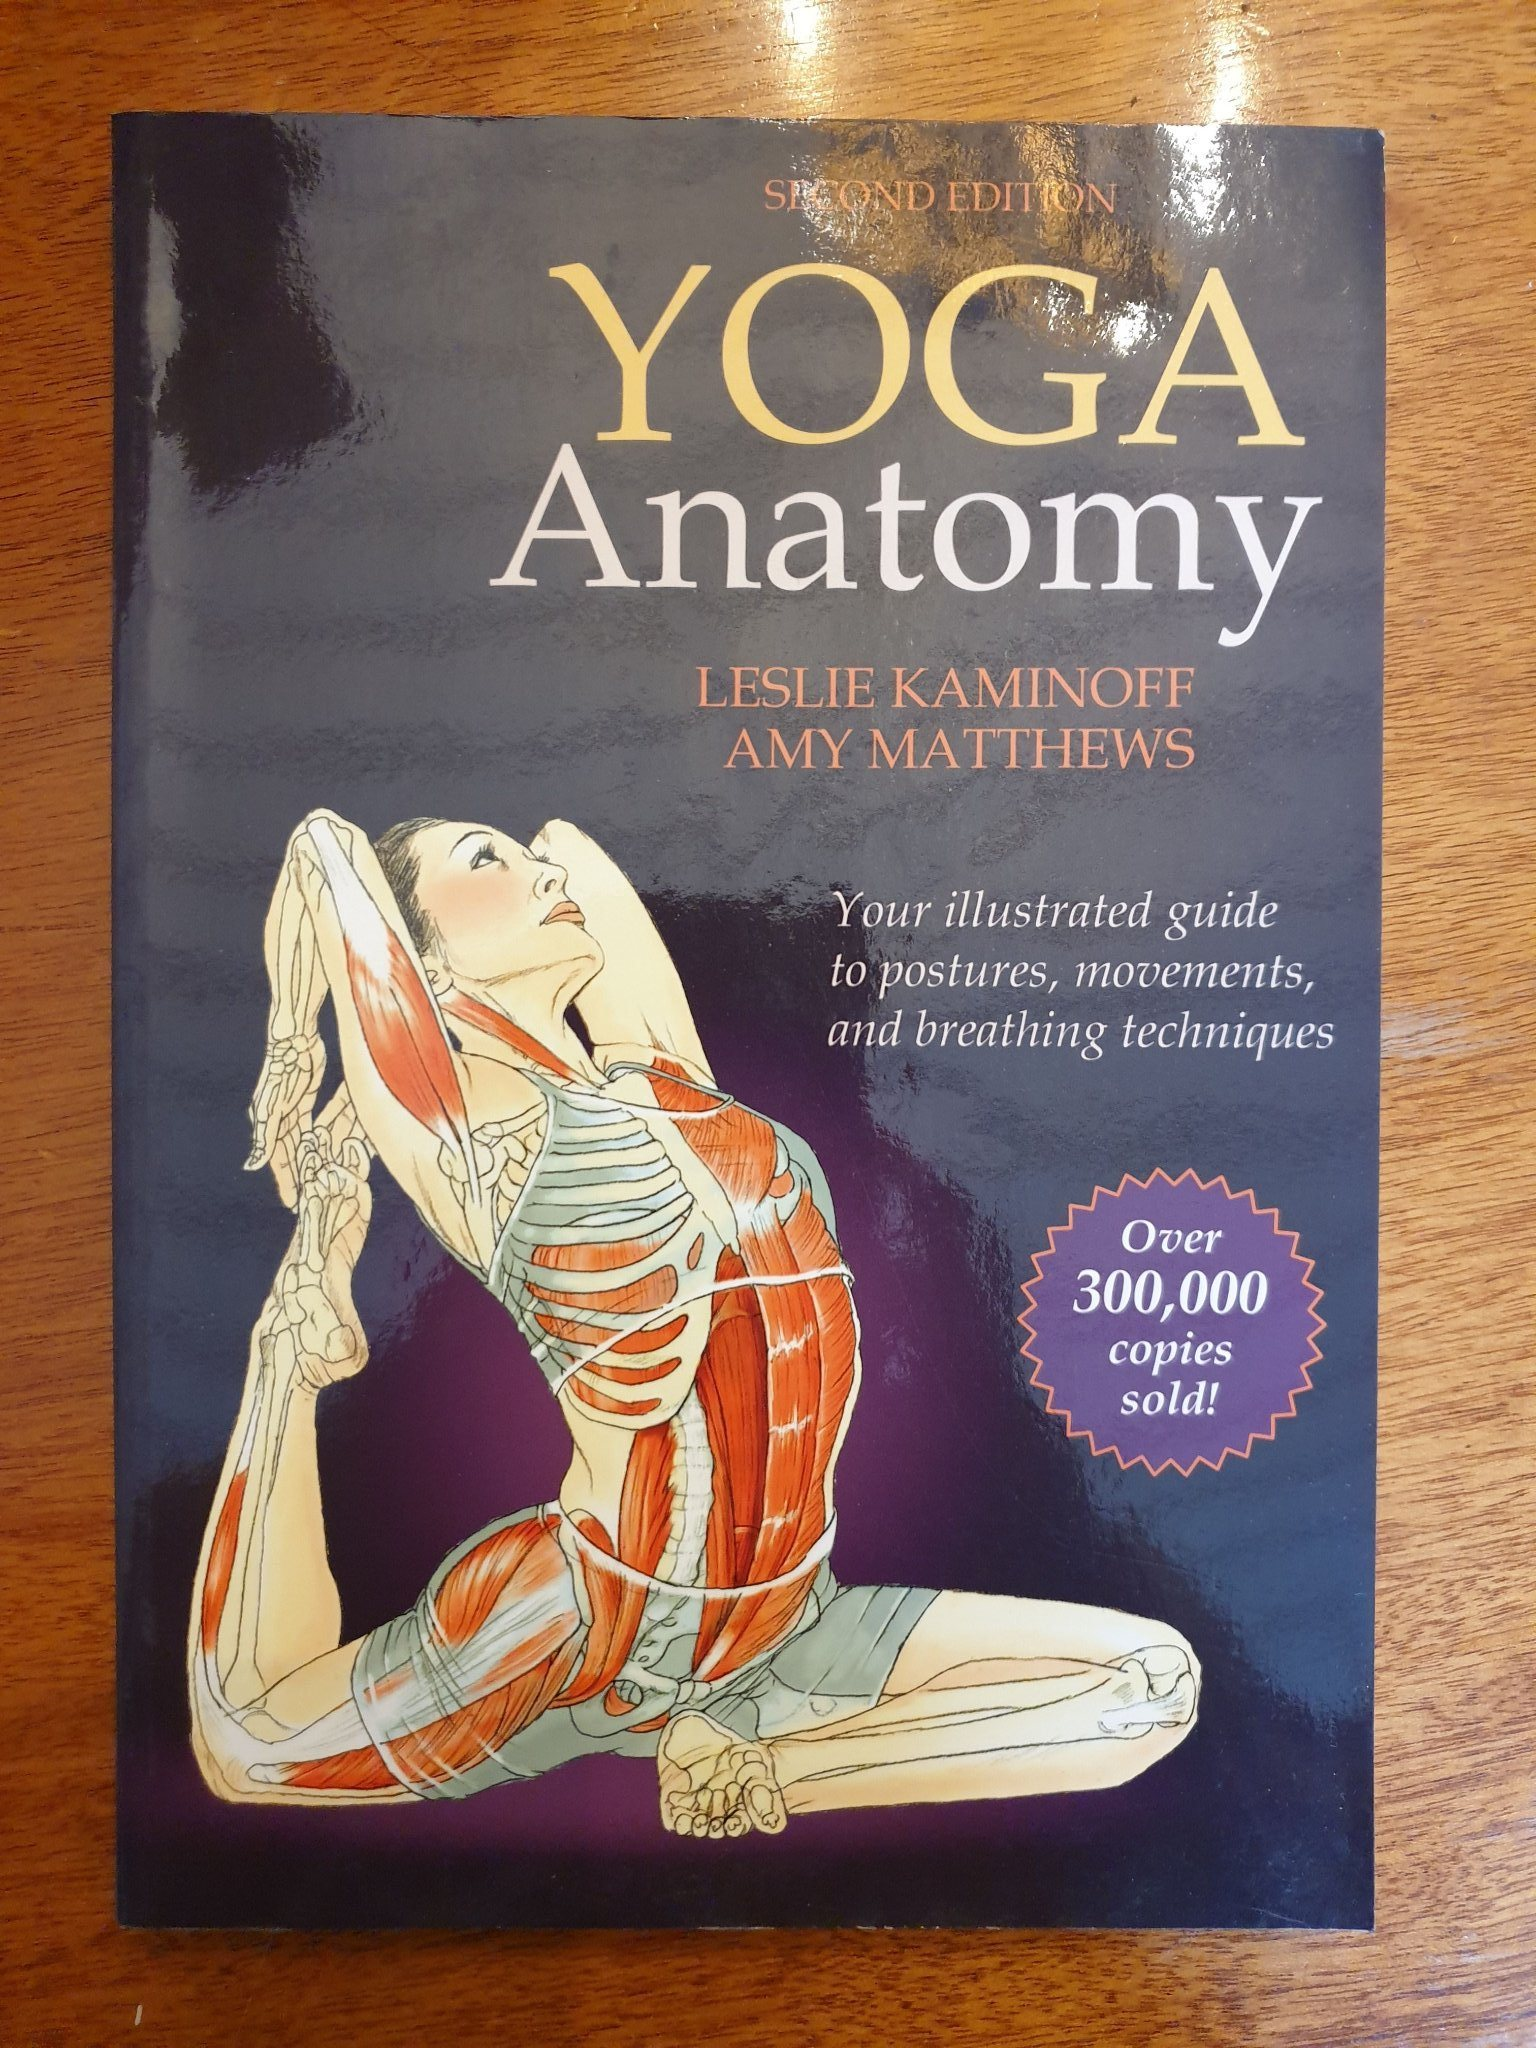 Yoga Anatomy Second Edition Leslie Kaminoff Amy 338886152 Kp